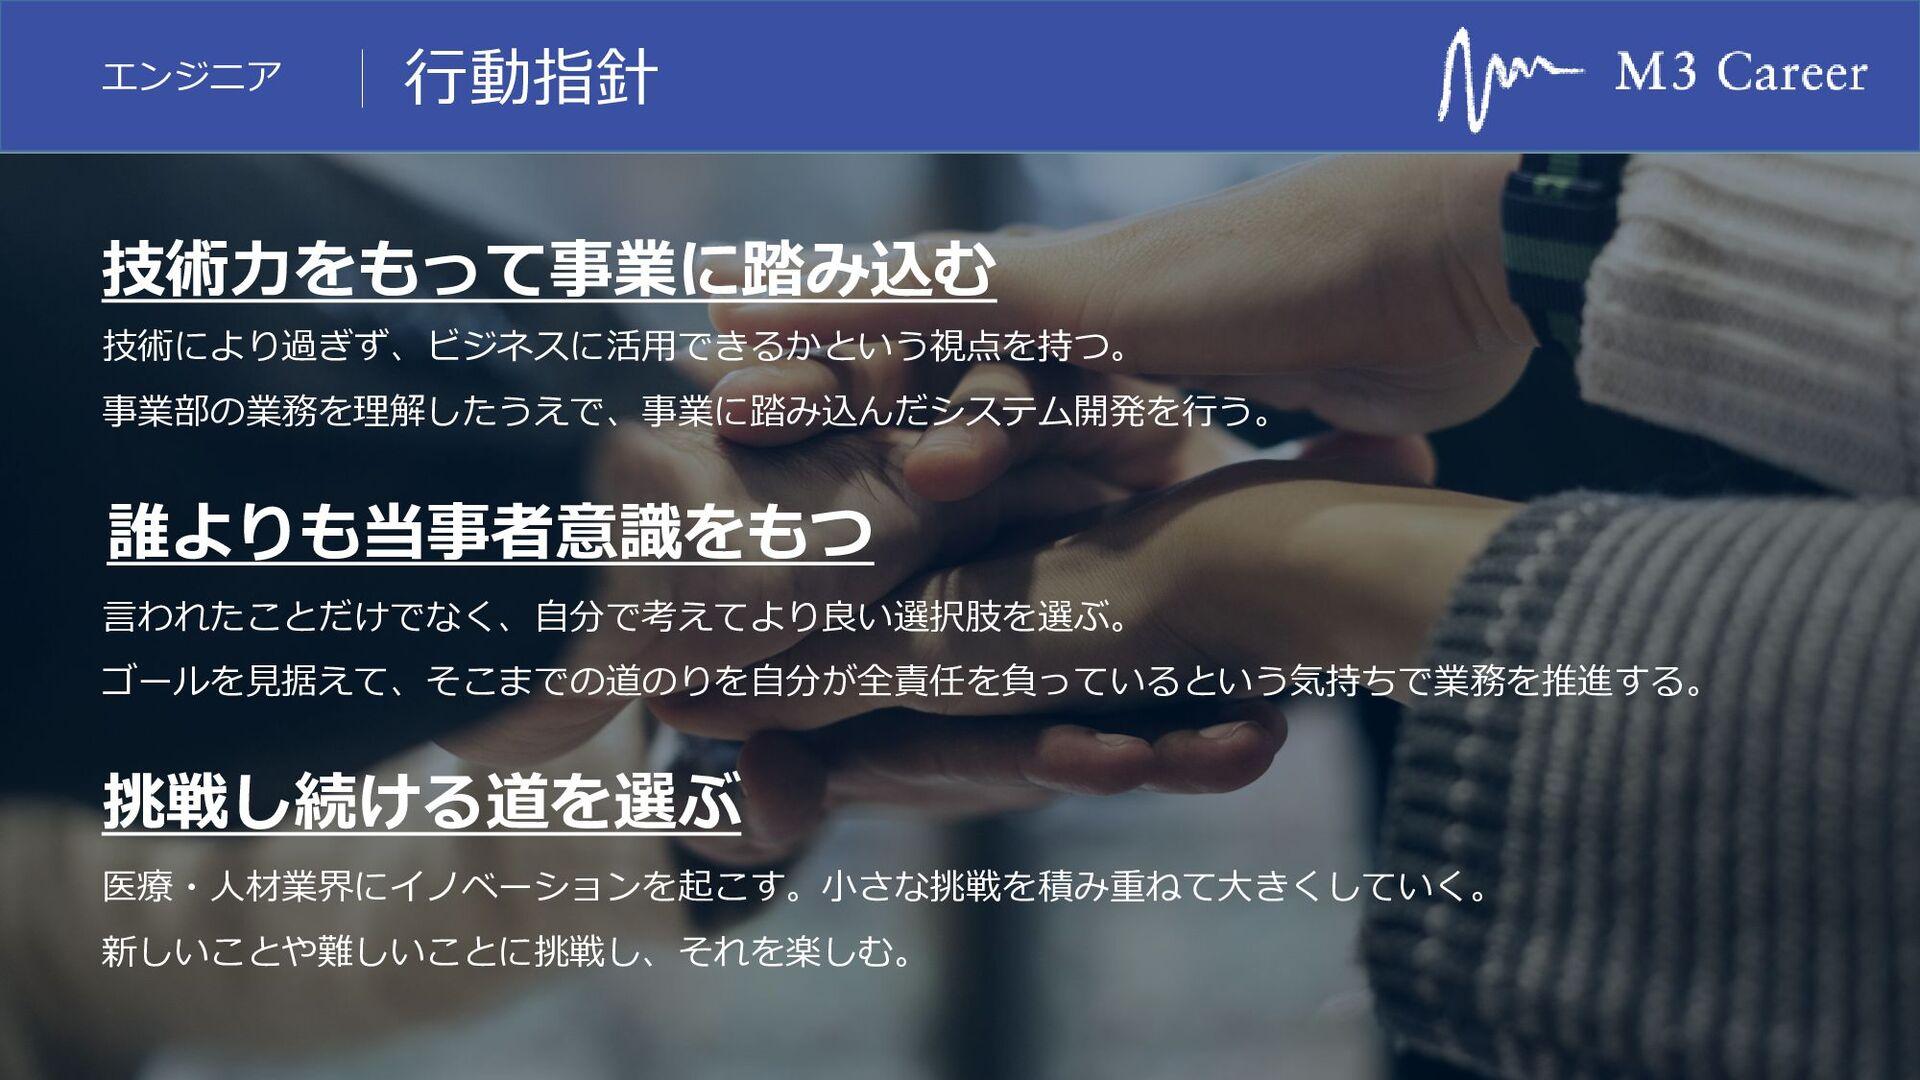 COVID-19による事業への影響